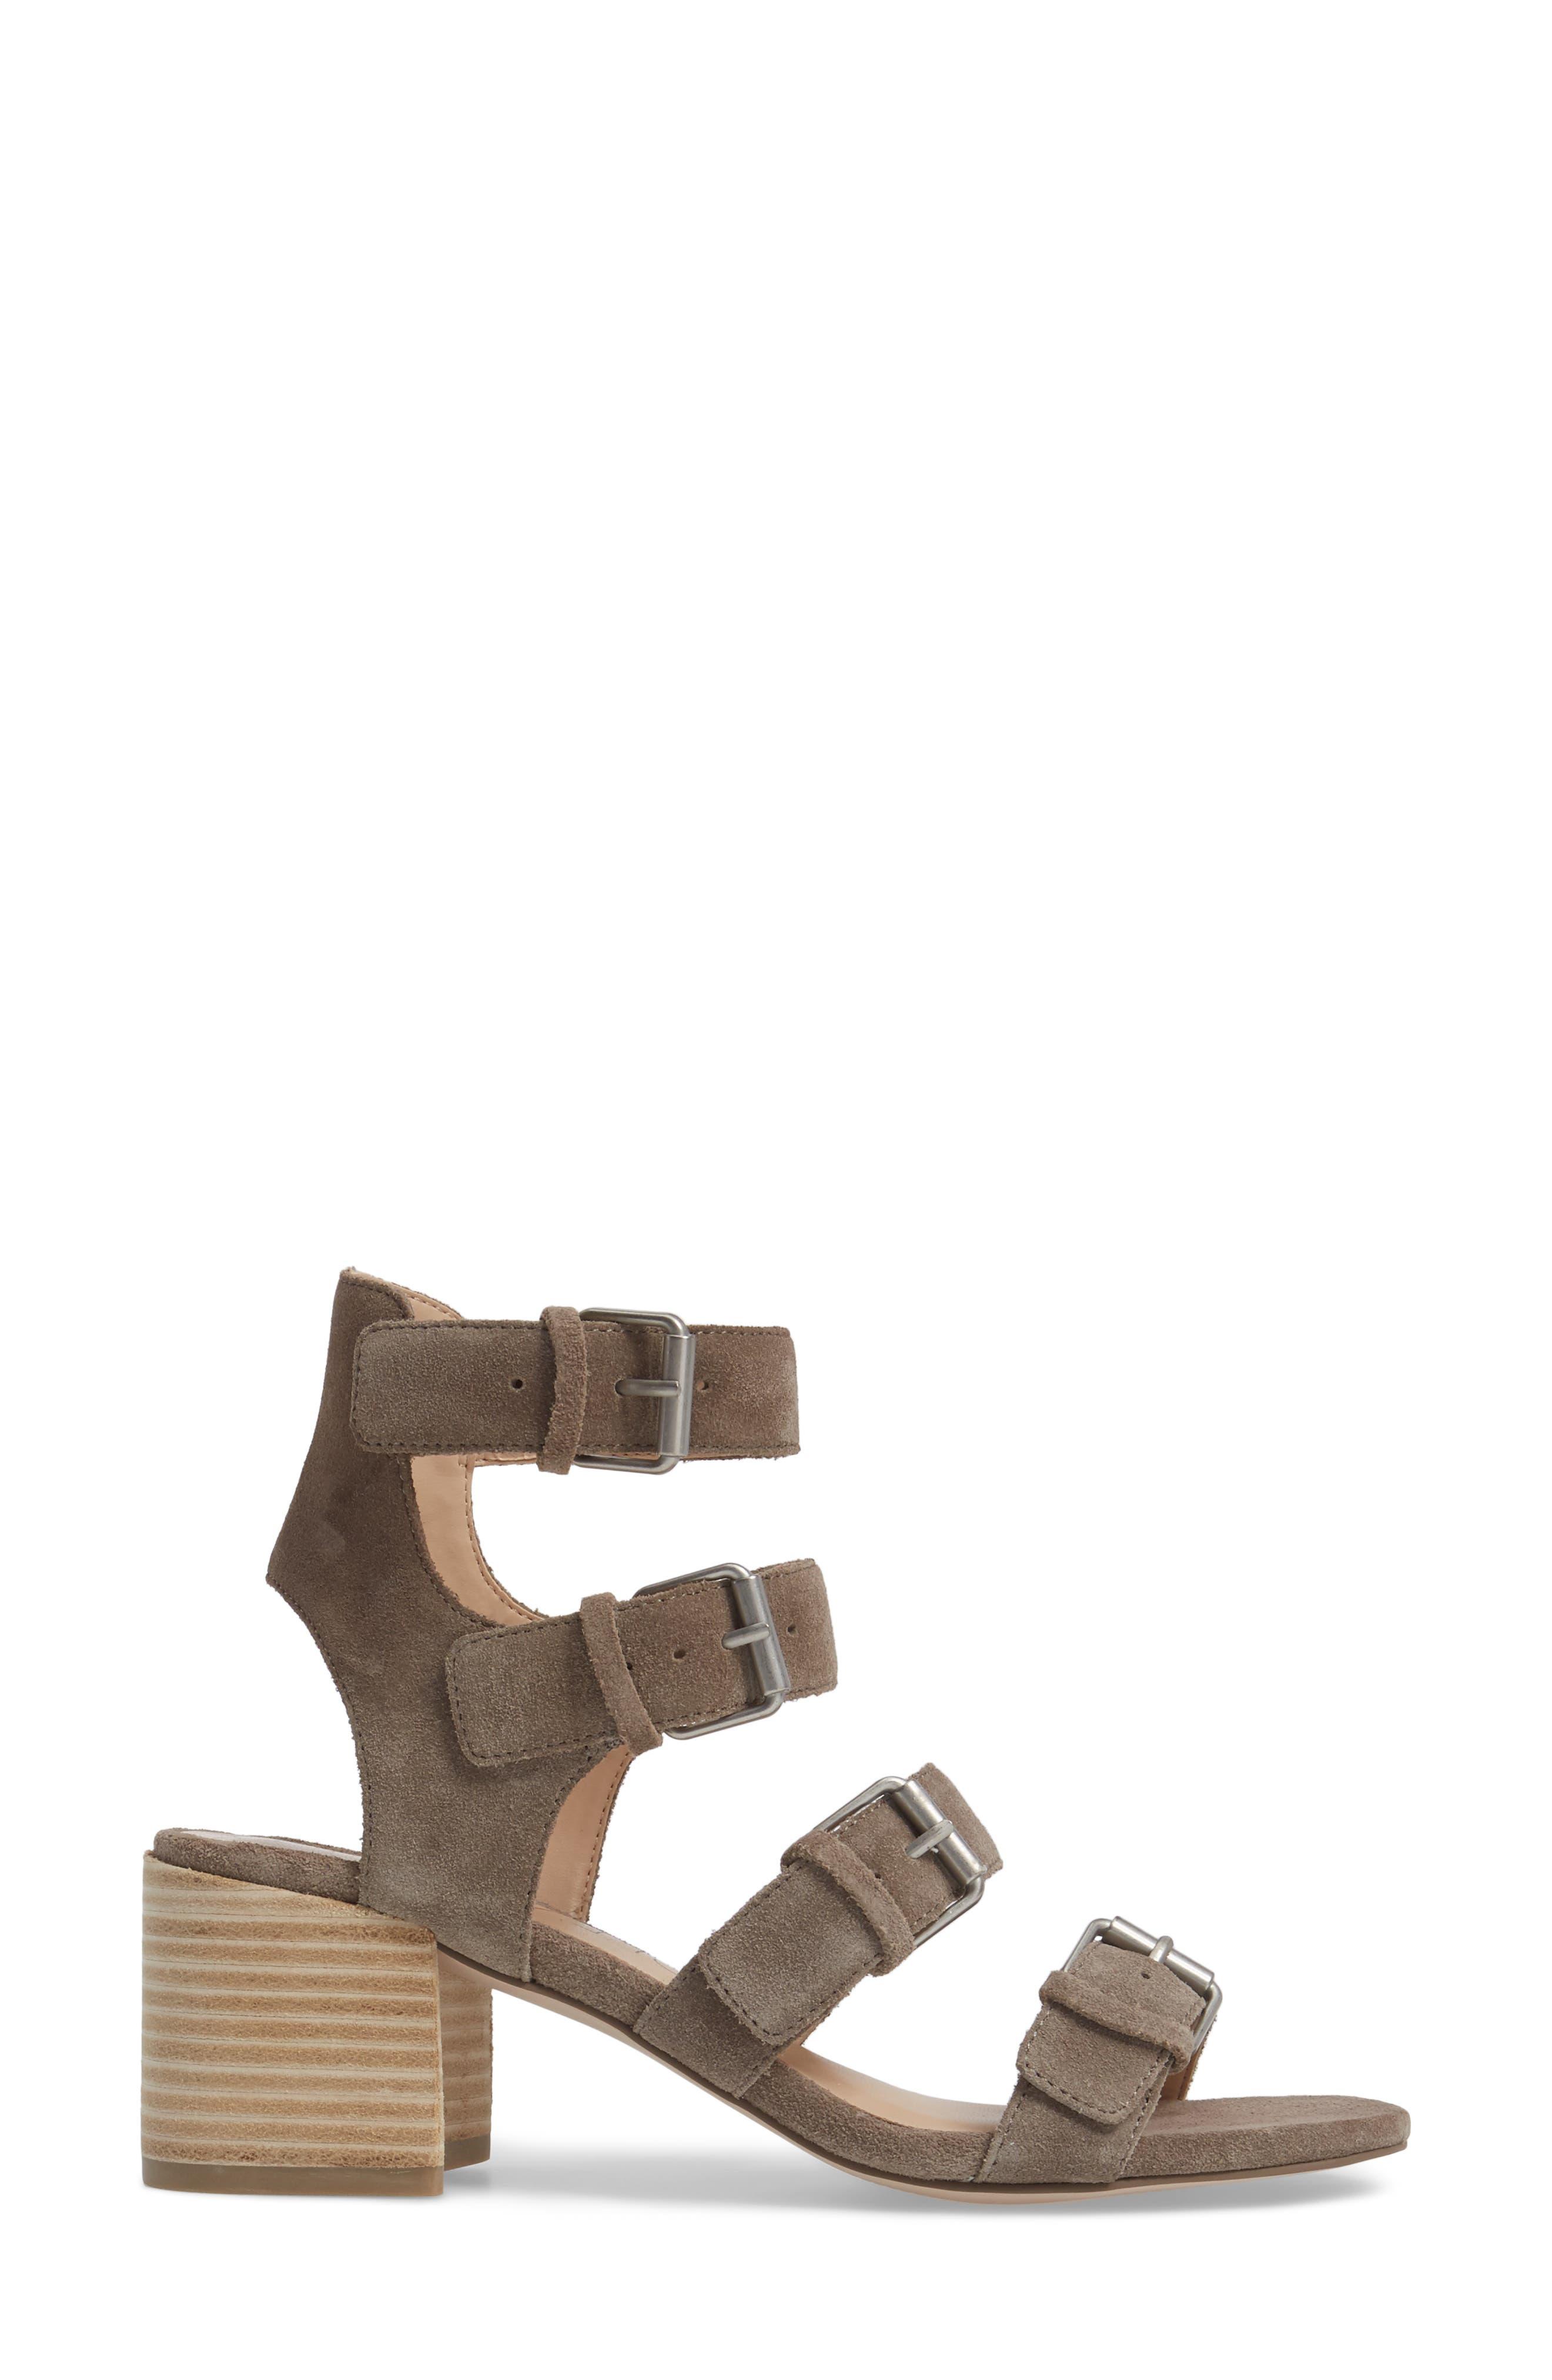 Culver Block Heel Sandal,                             Alternate thumbnail 3, color,                             MUSHROOM SUEDE